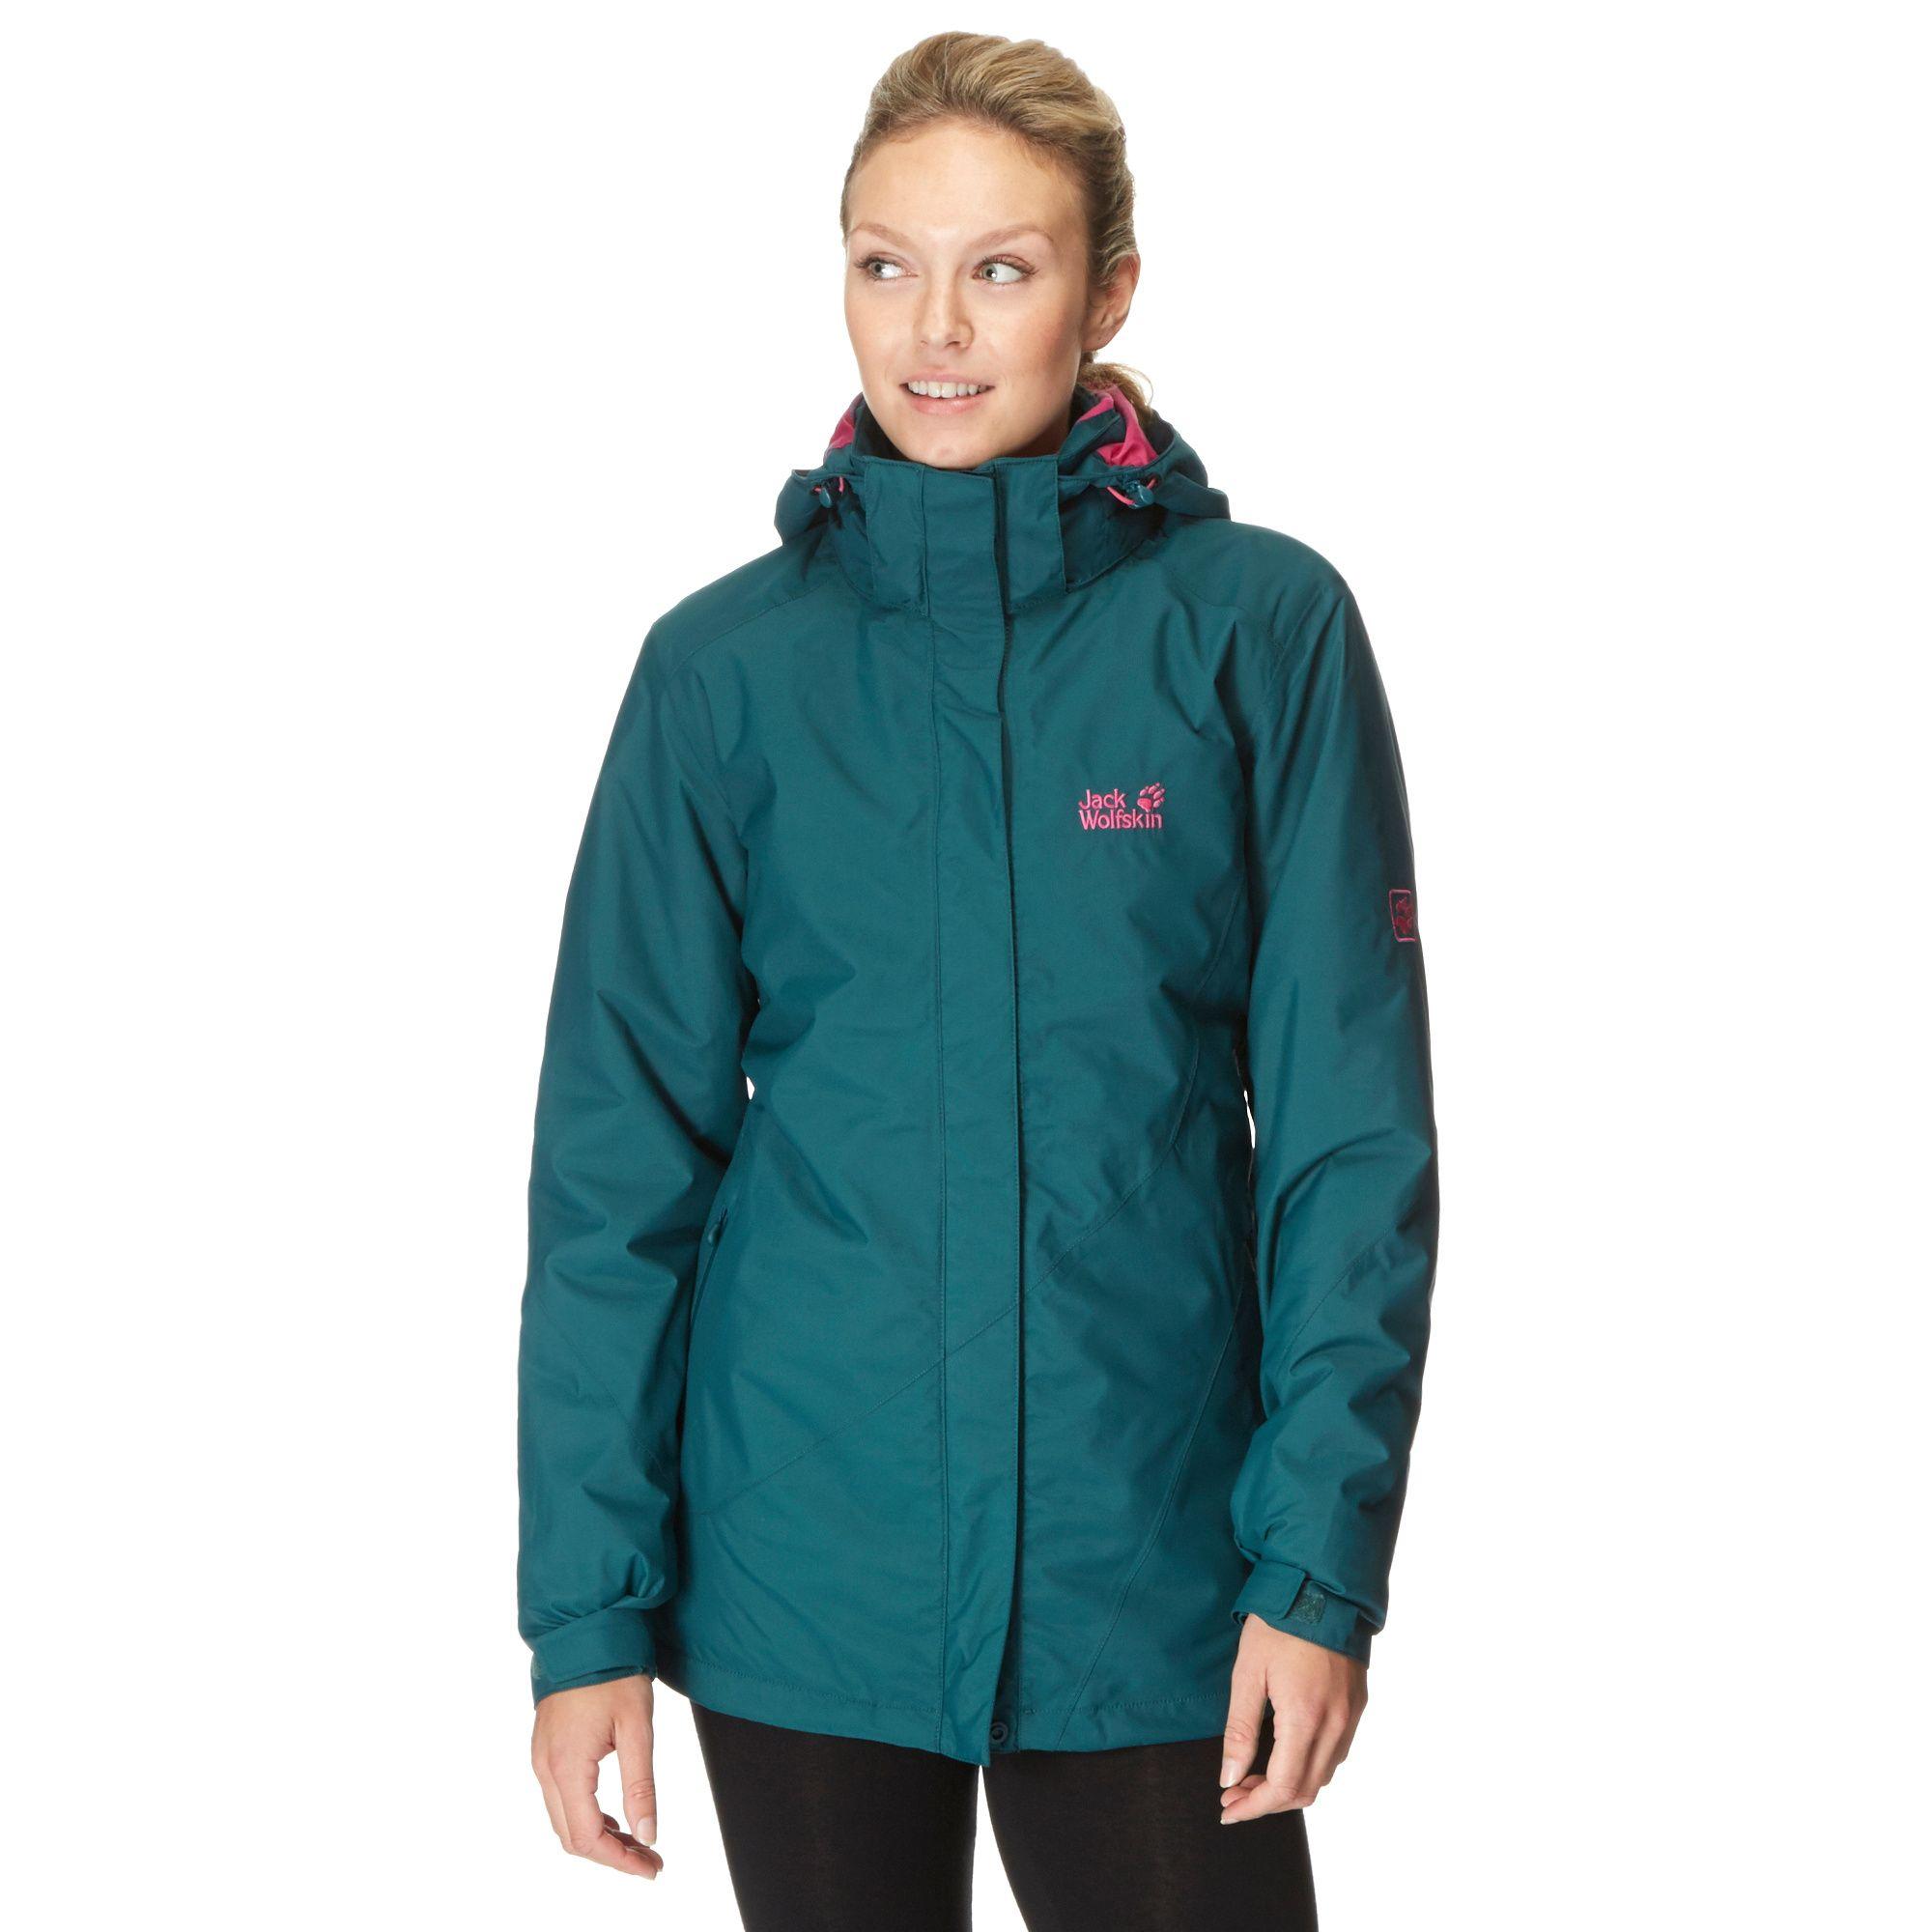 JACK WOLFSKIN Women's Arbourg 3 in 1 Hiking Jacket